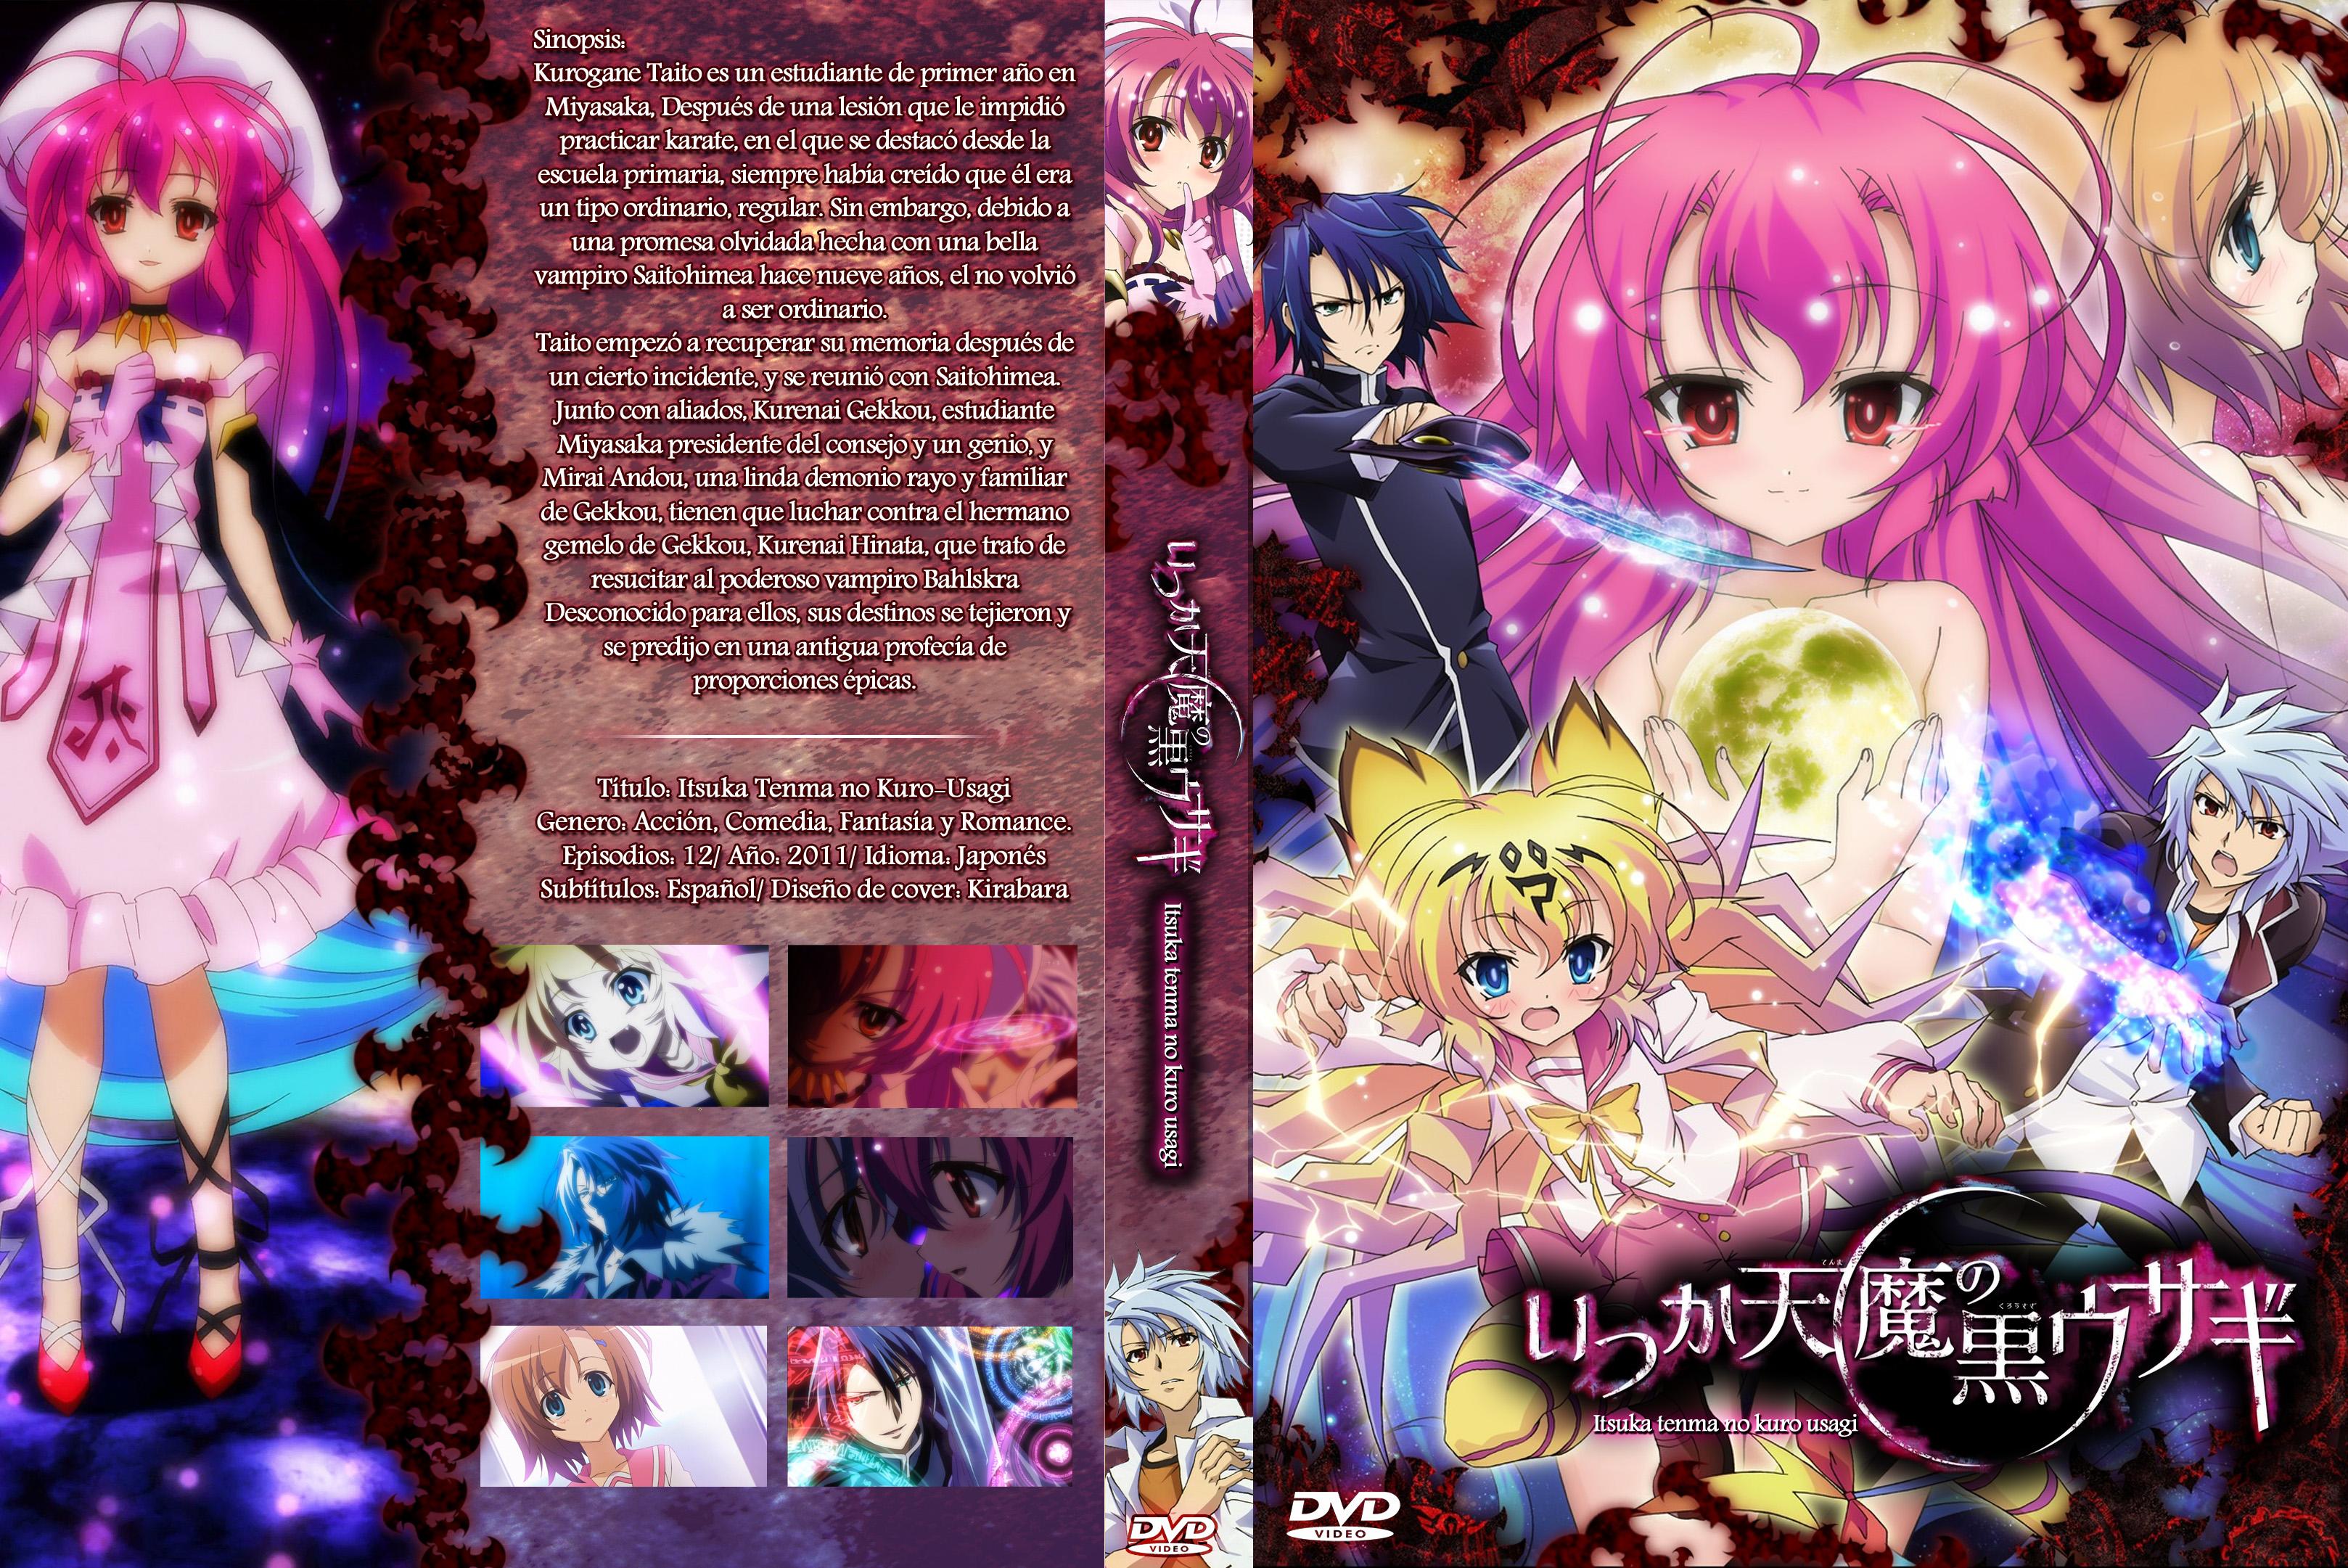 http://fc08.deviantart.net/fs70/f/2013/246/7/e/tenma_no_kuro_usagi_dvd_by_ojamajo_sandy-d6kwux7.jpg